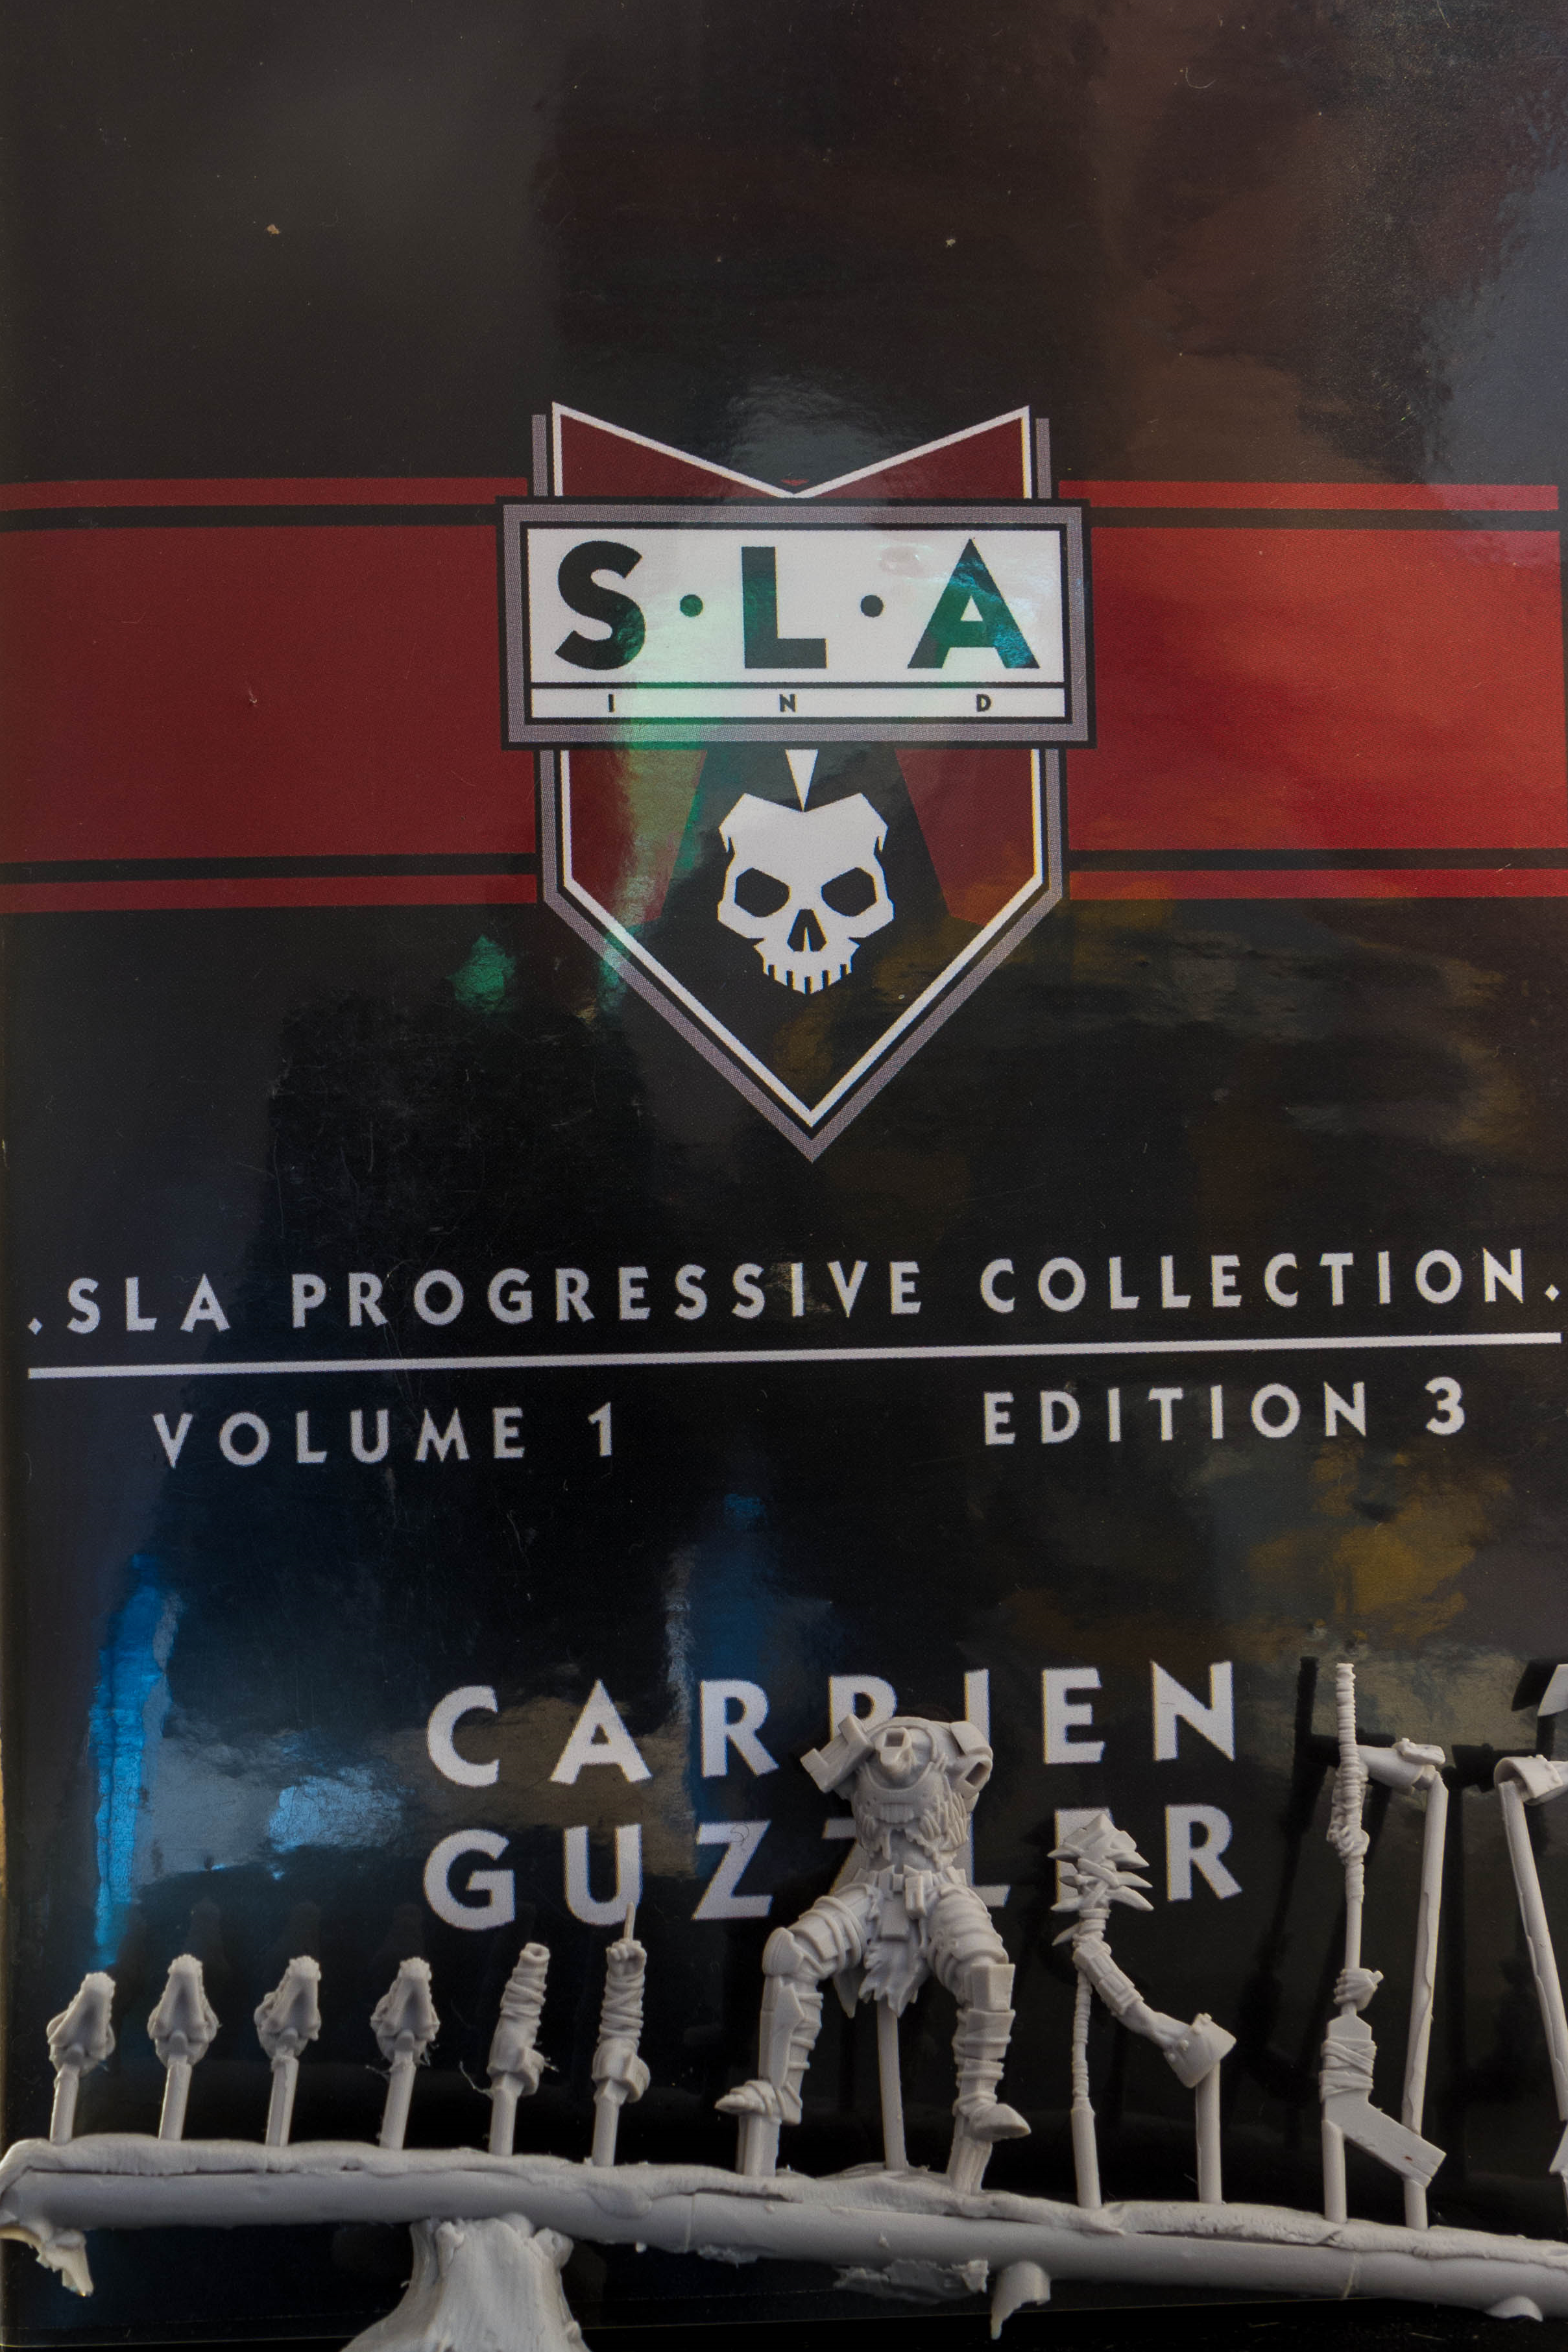 SLA Progressive Collection – Carrien Guzzler